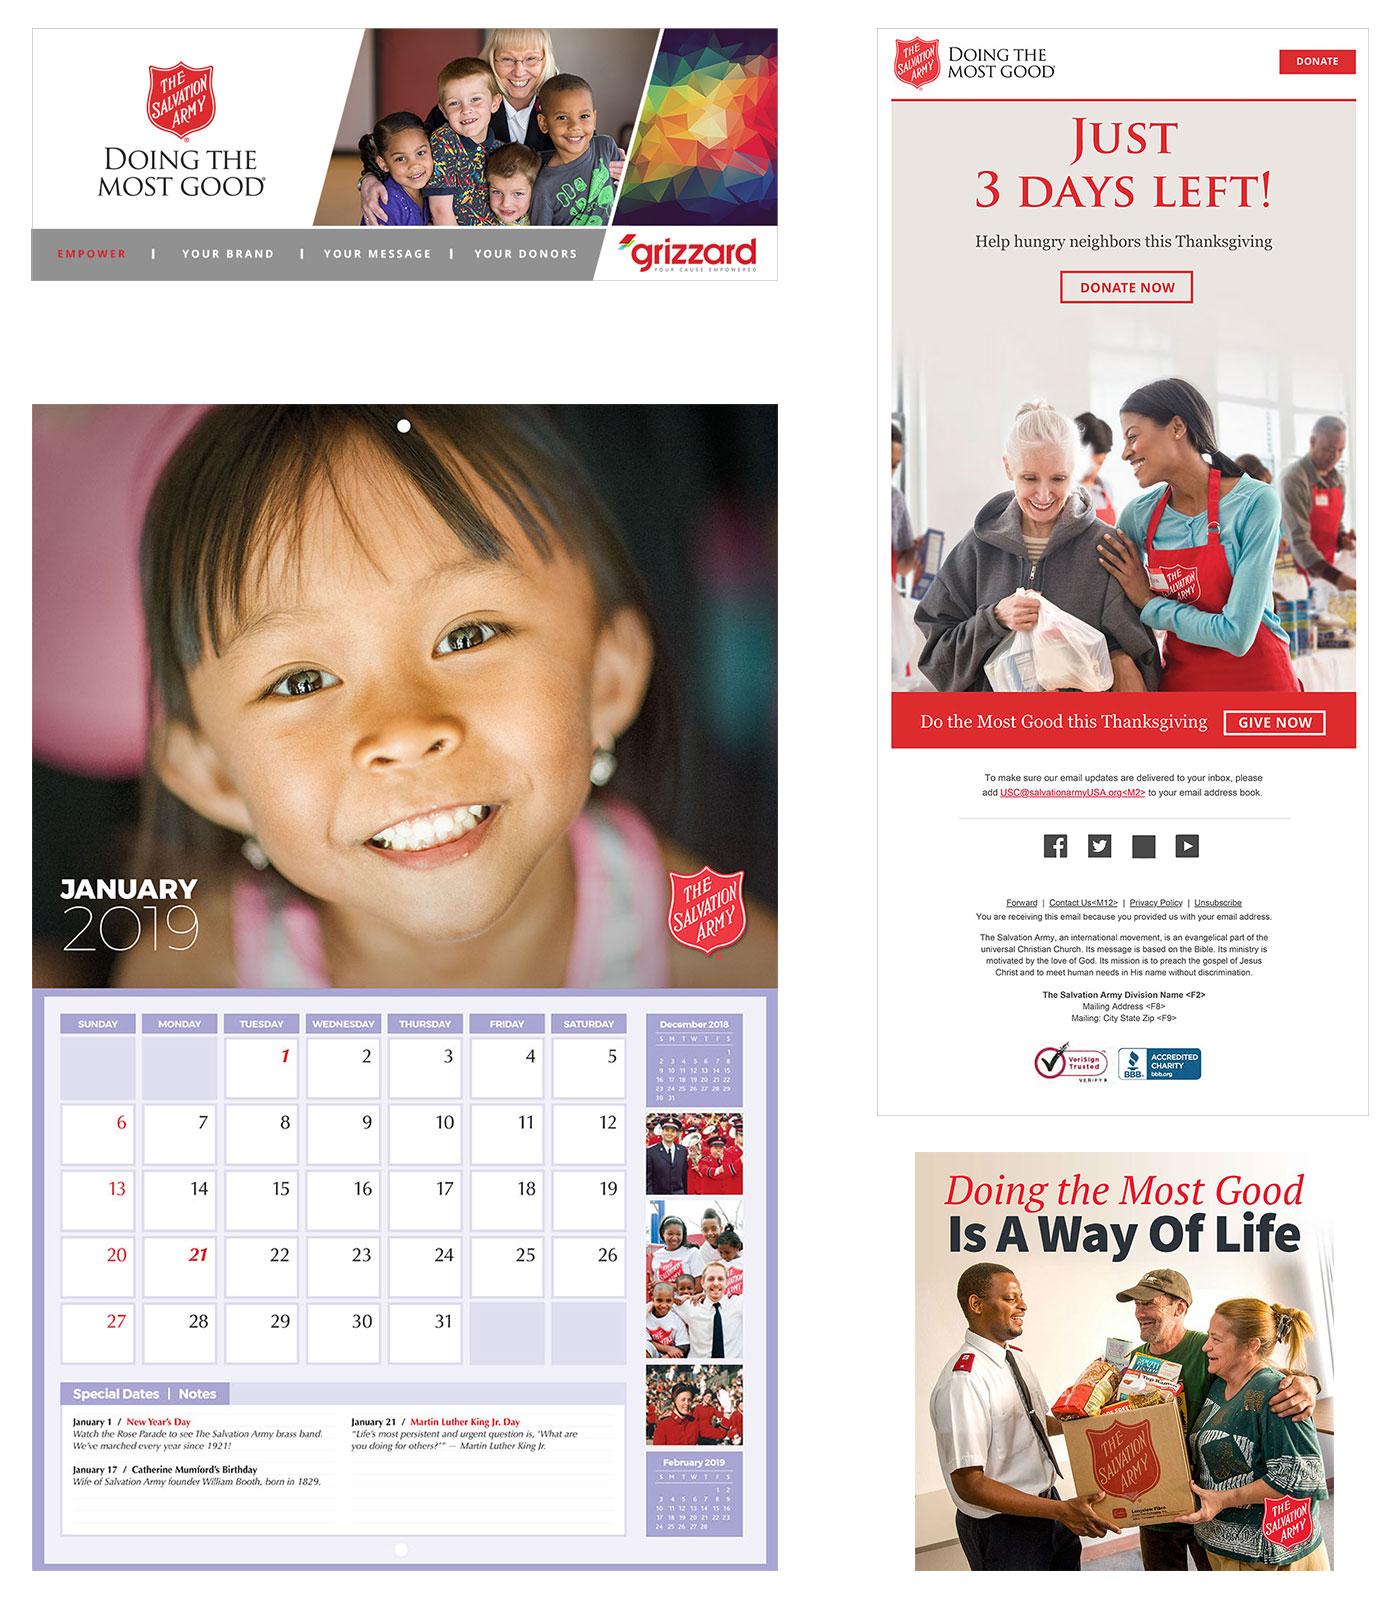 TSA work samples email digital media calendar